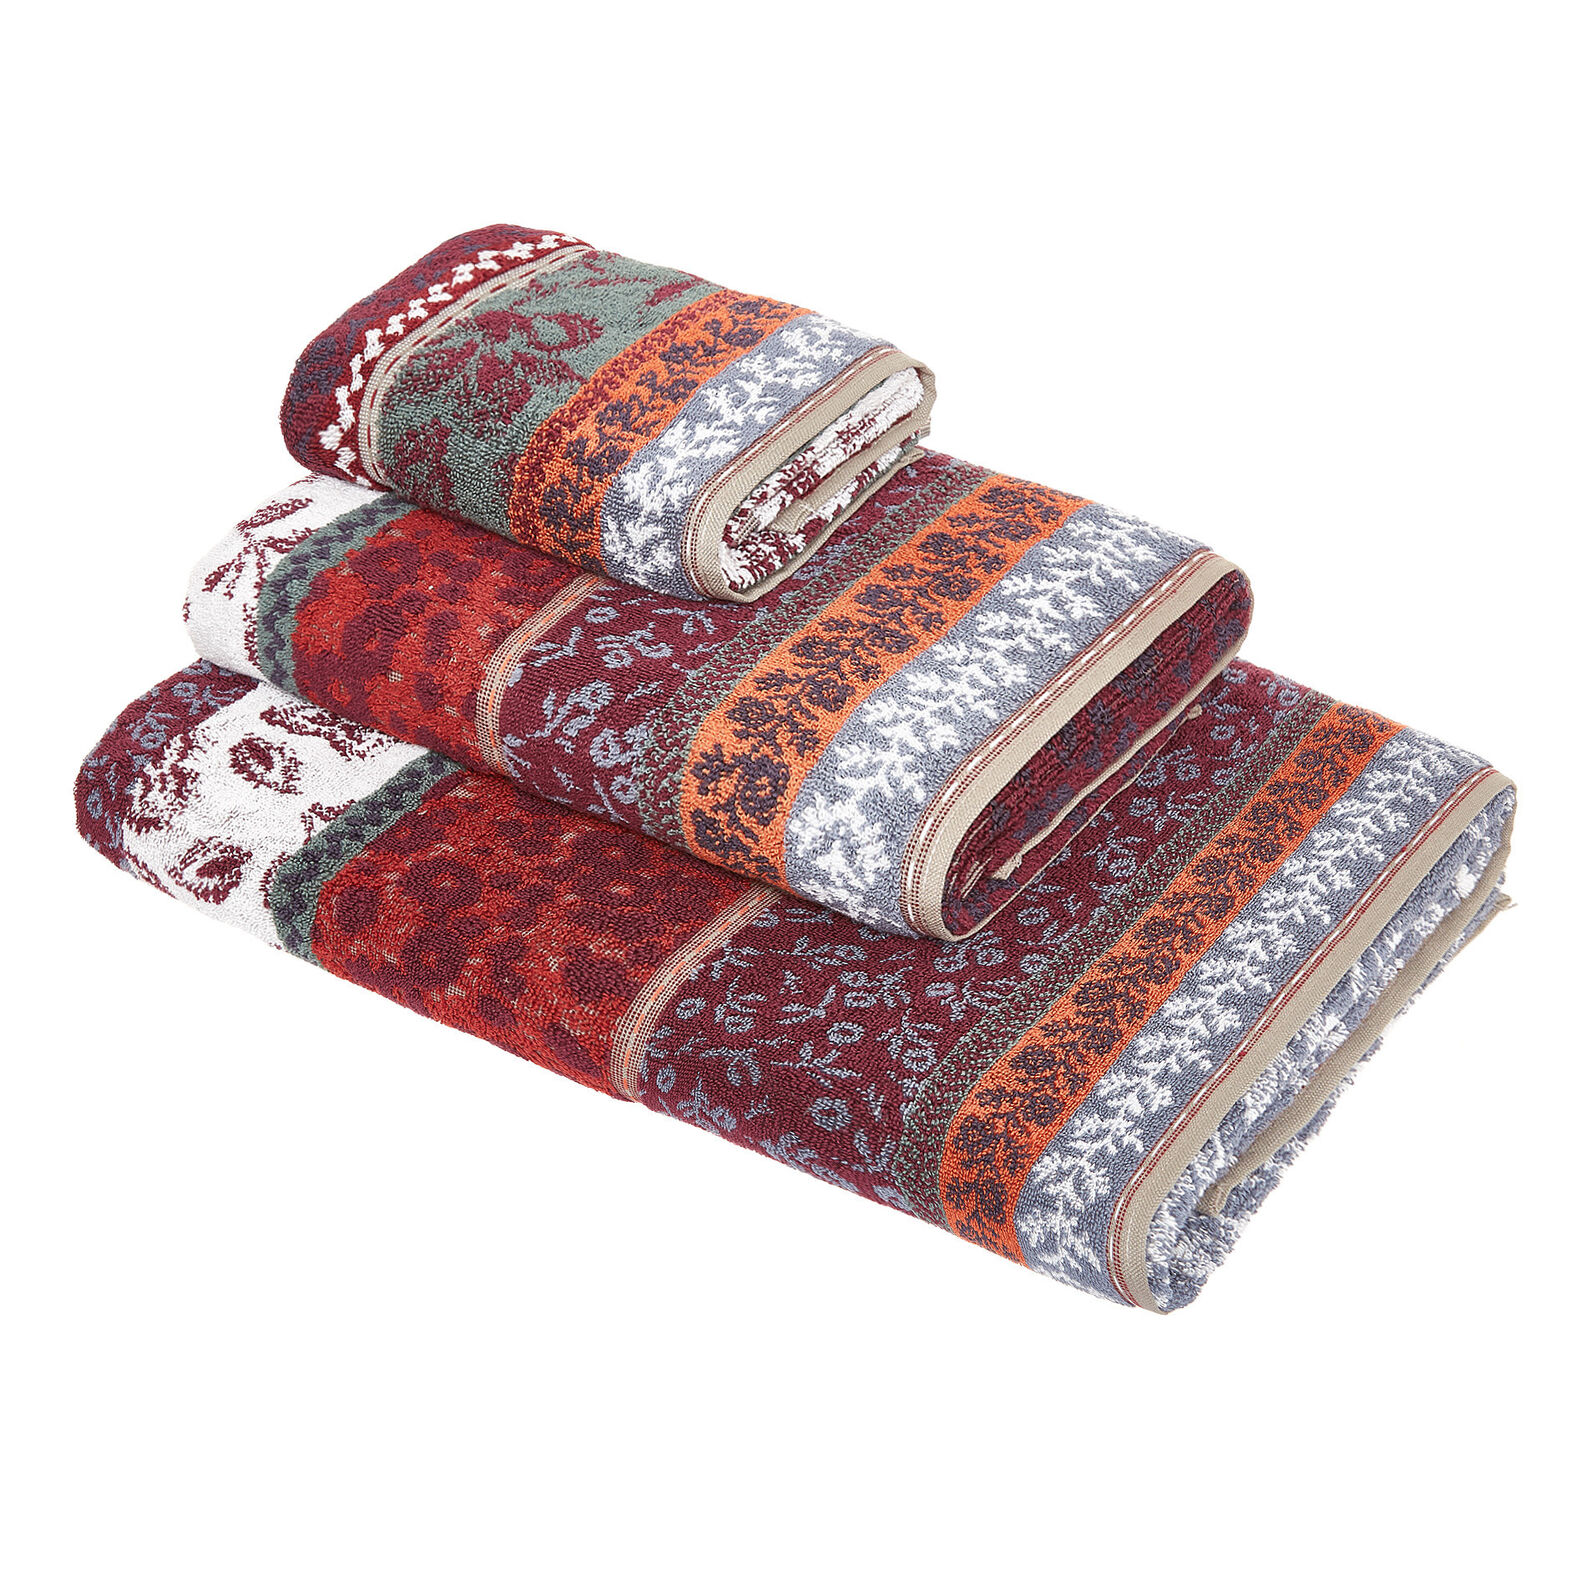 Asciugamano cotone disegno jacquard floreale